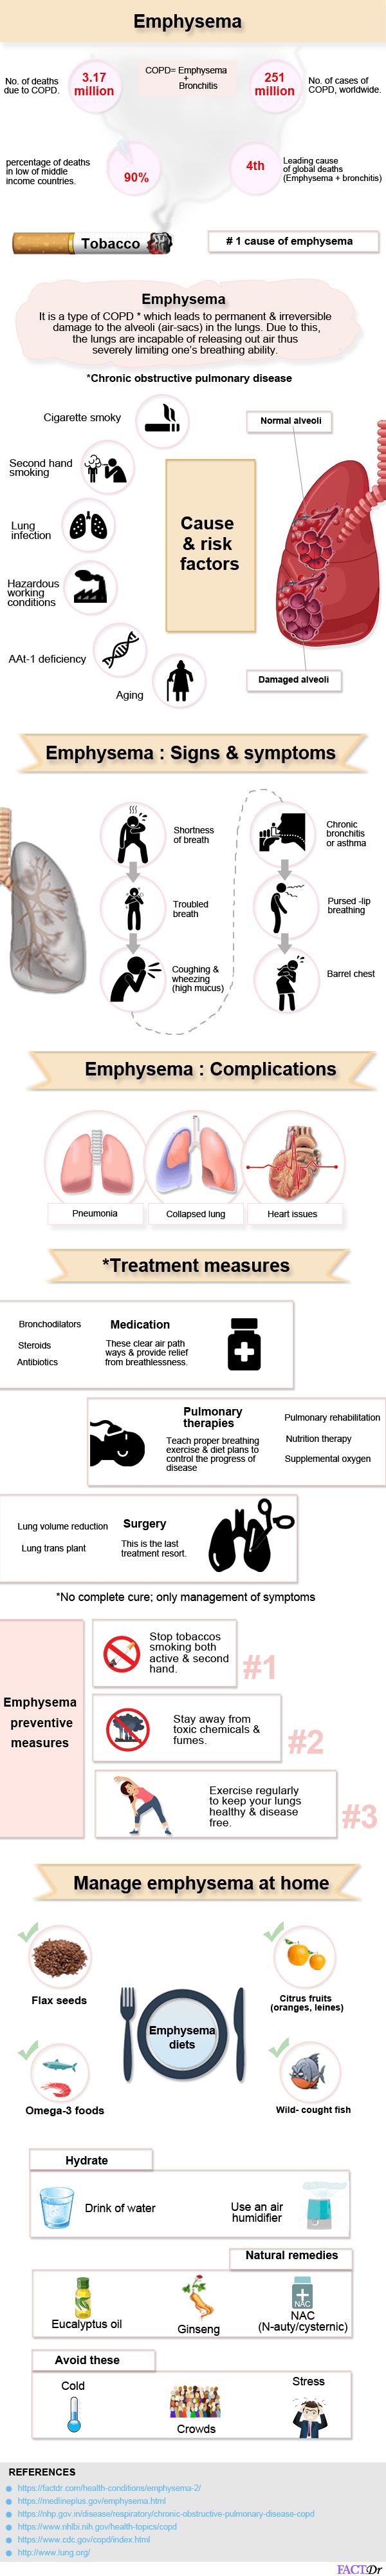 emphysema infographic